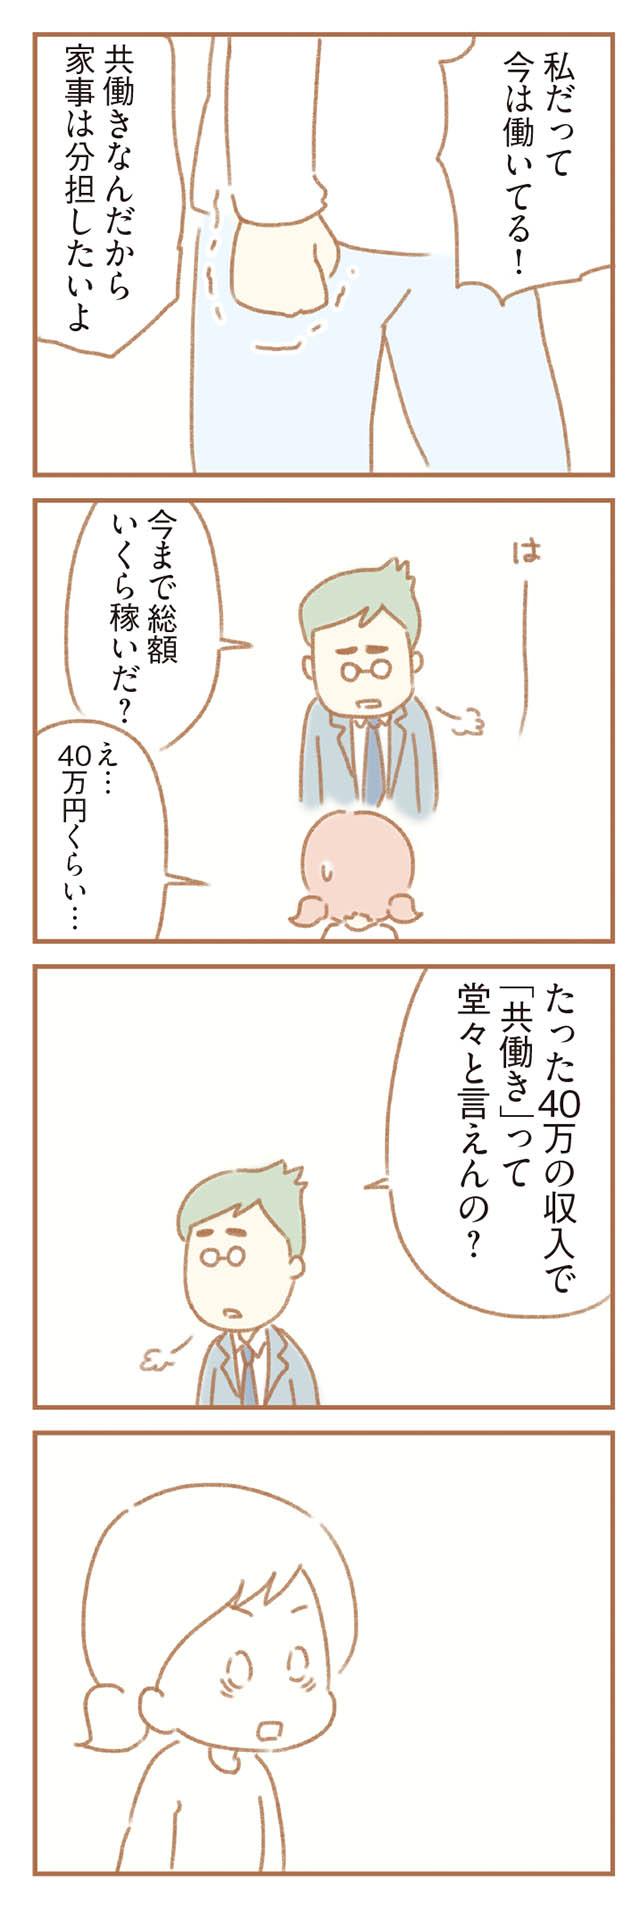 ottonohuyou_p12-1.jpg